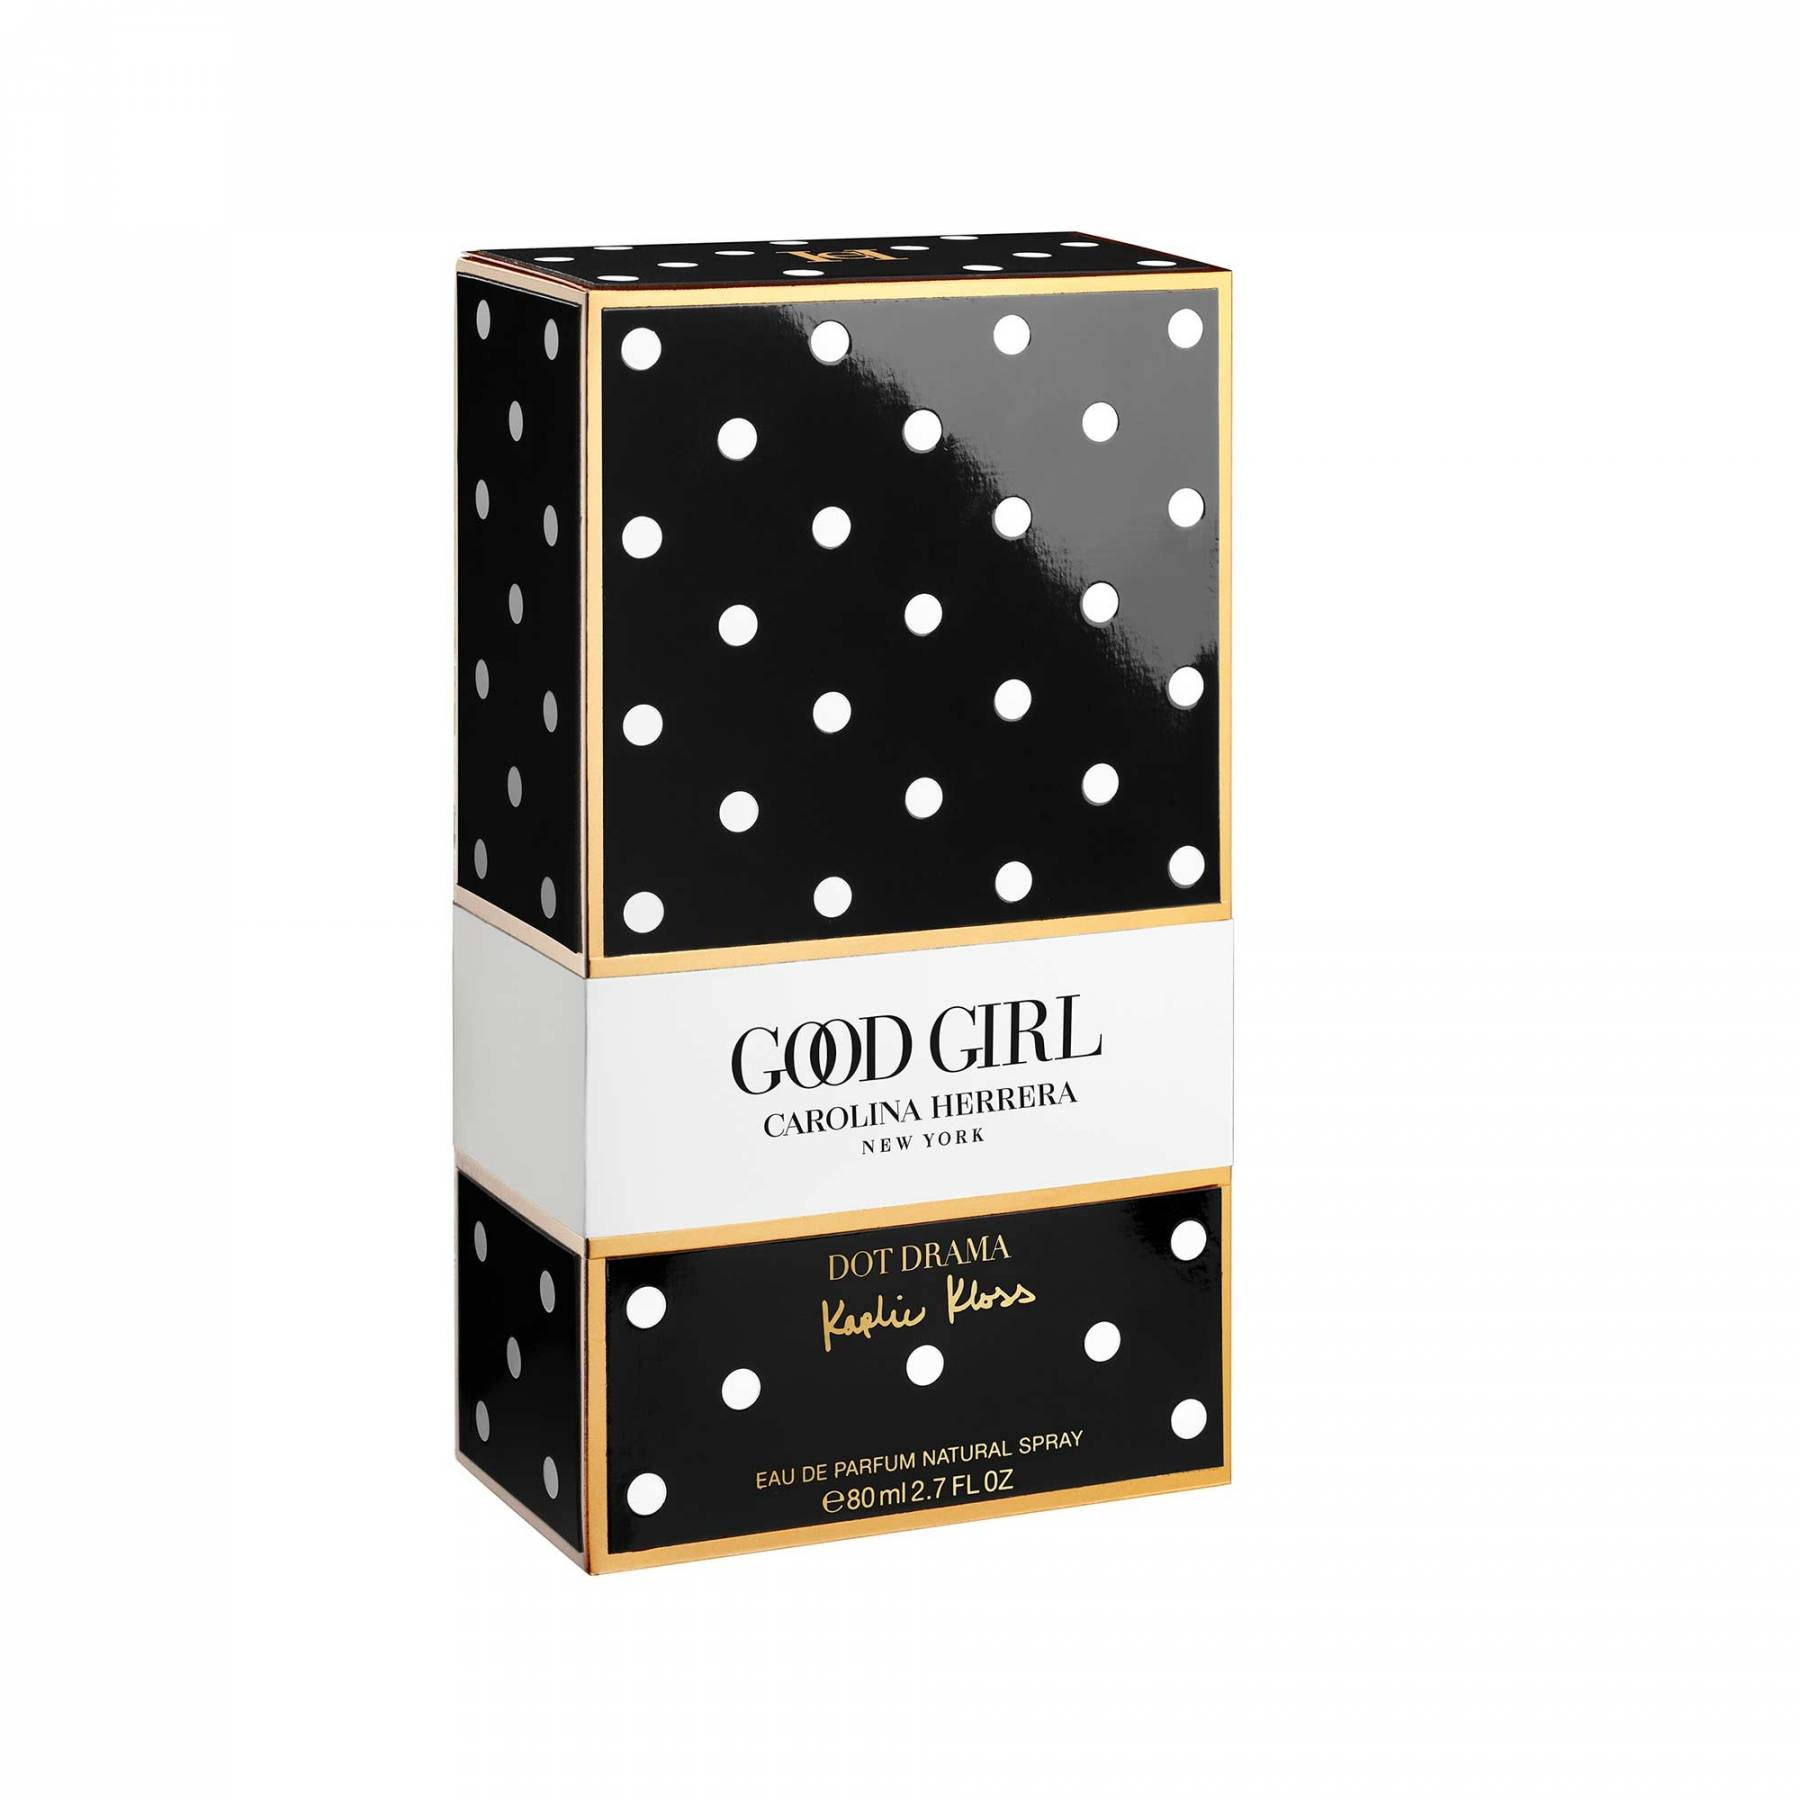 Perfume Good Girl Collector Dot Drama Carolina Herrera Feminino Eau de Parfum 80ml